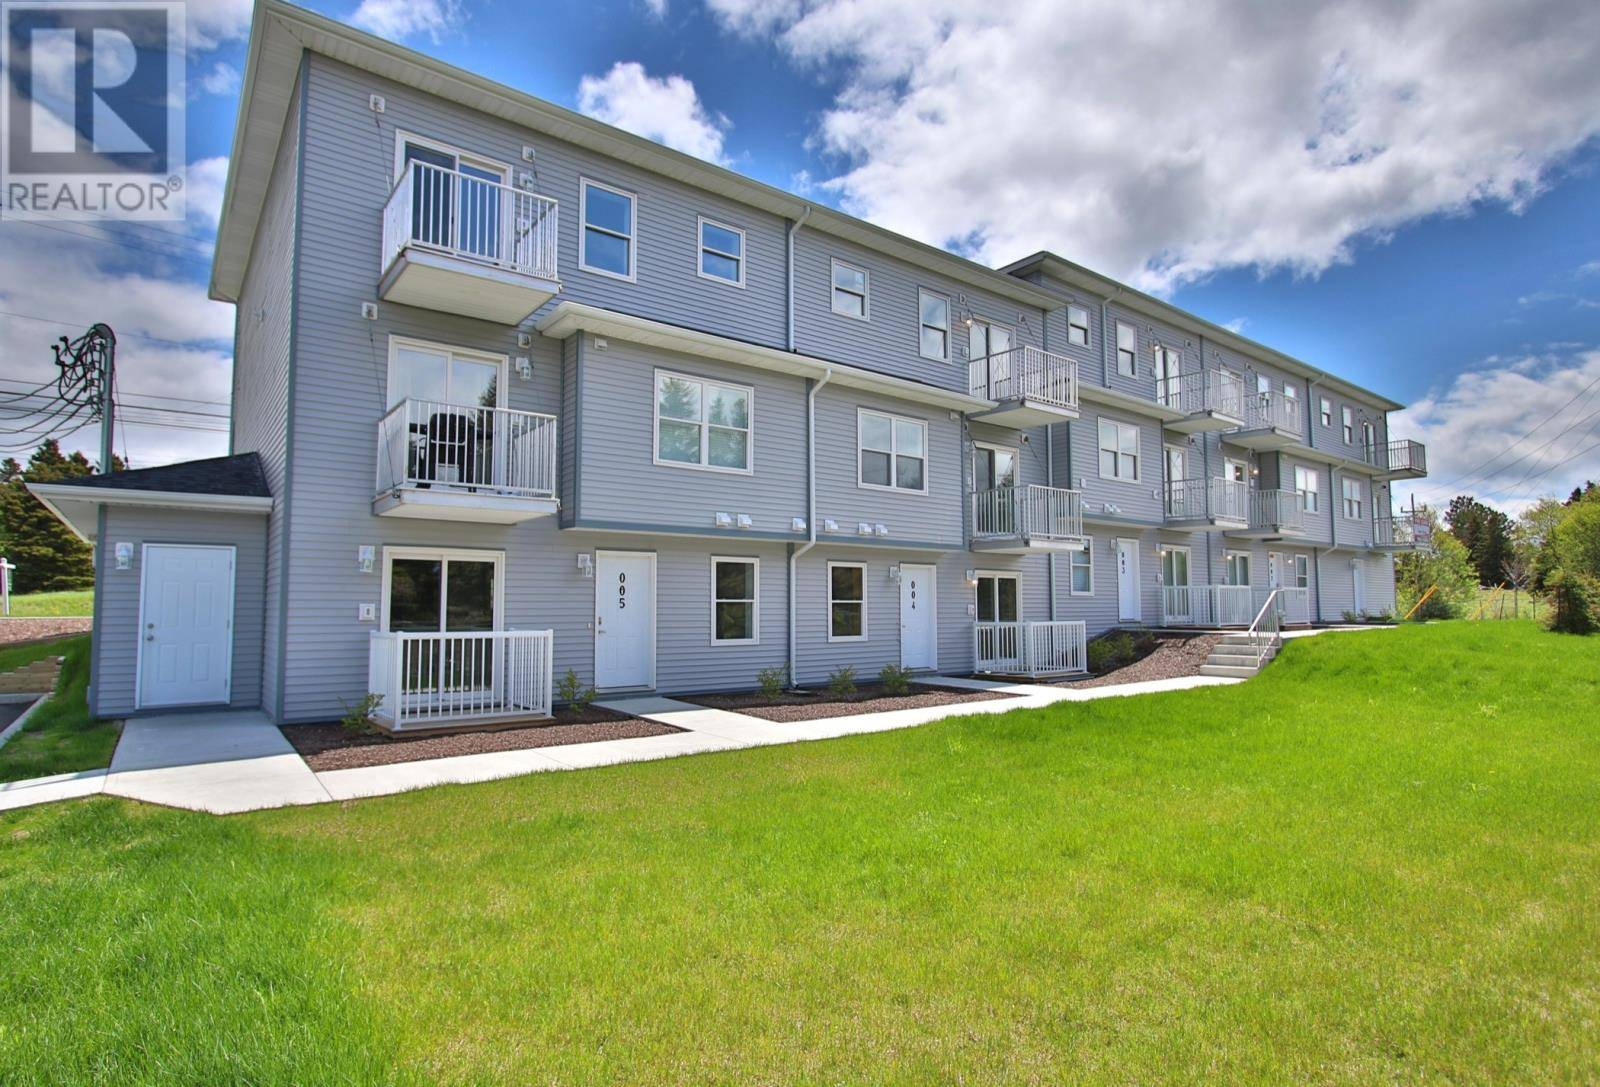 House for sale at 56 Bay Bulls Rd Unit 202 St. John's Newfoundland - MLS: 1200952